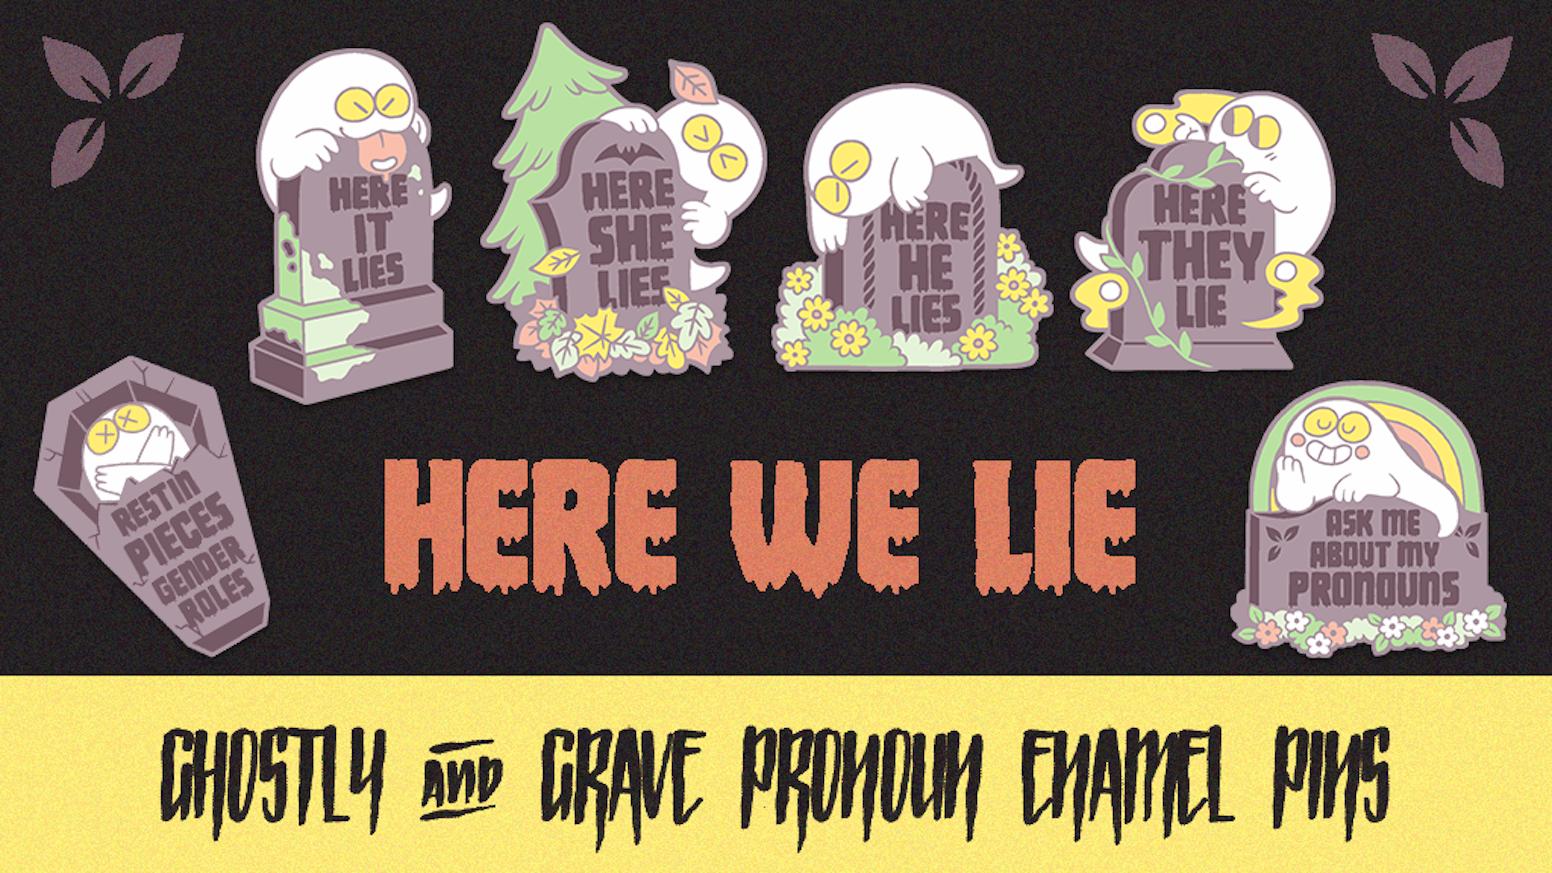 Here We Lie [Ghostly & Grave Pronoun Enamel Pins] by Split